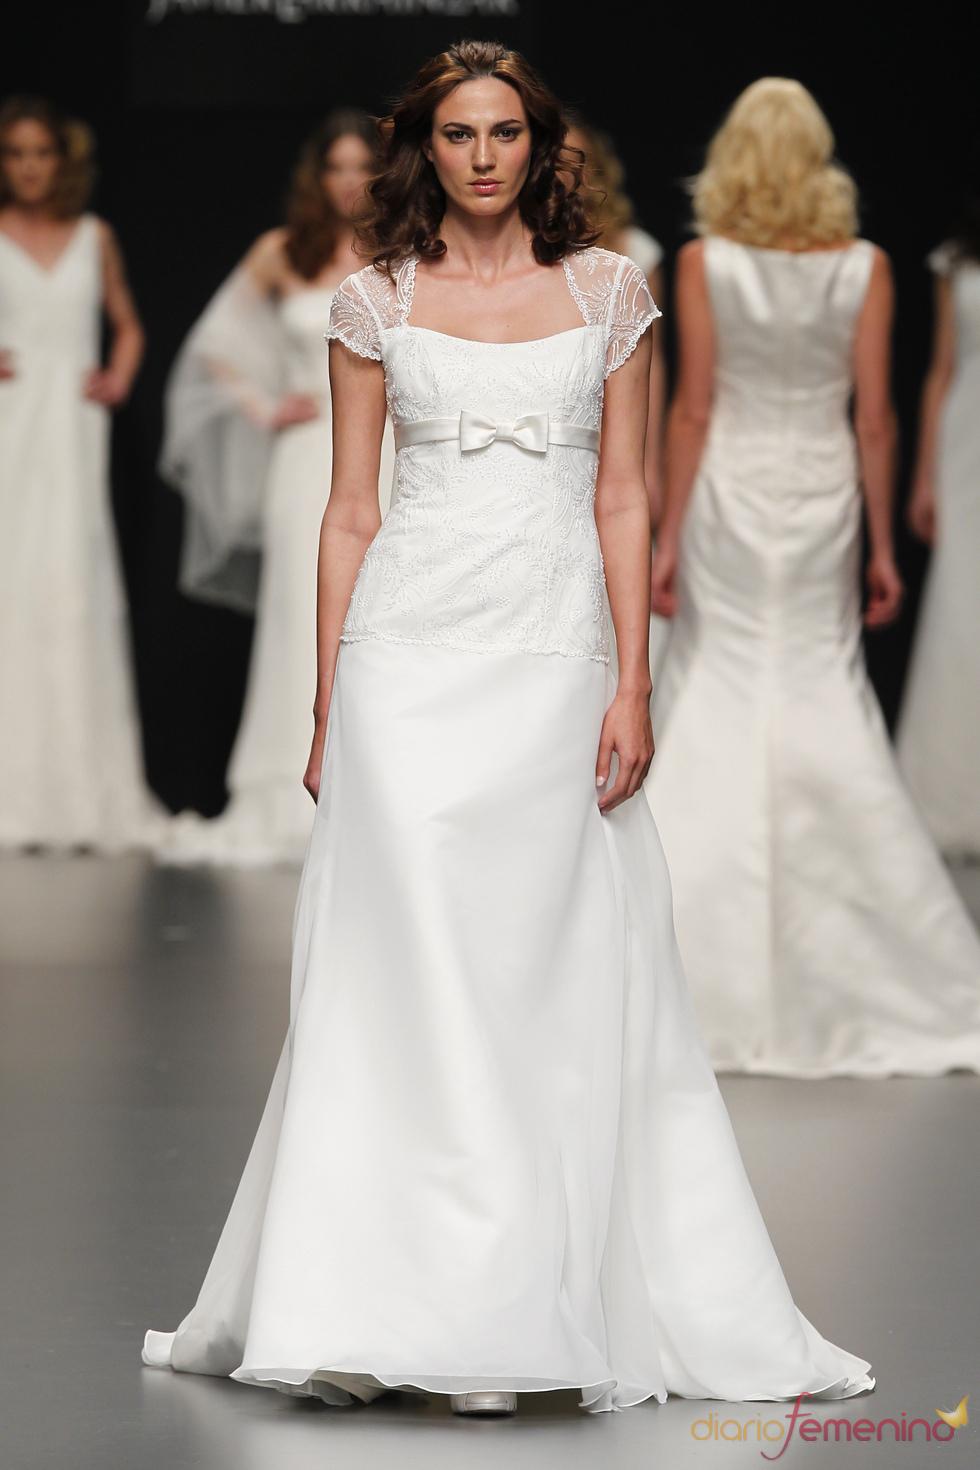 Vestido de novia con lazo de Javier Larrainzar